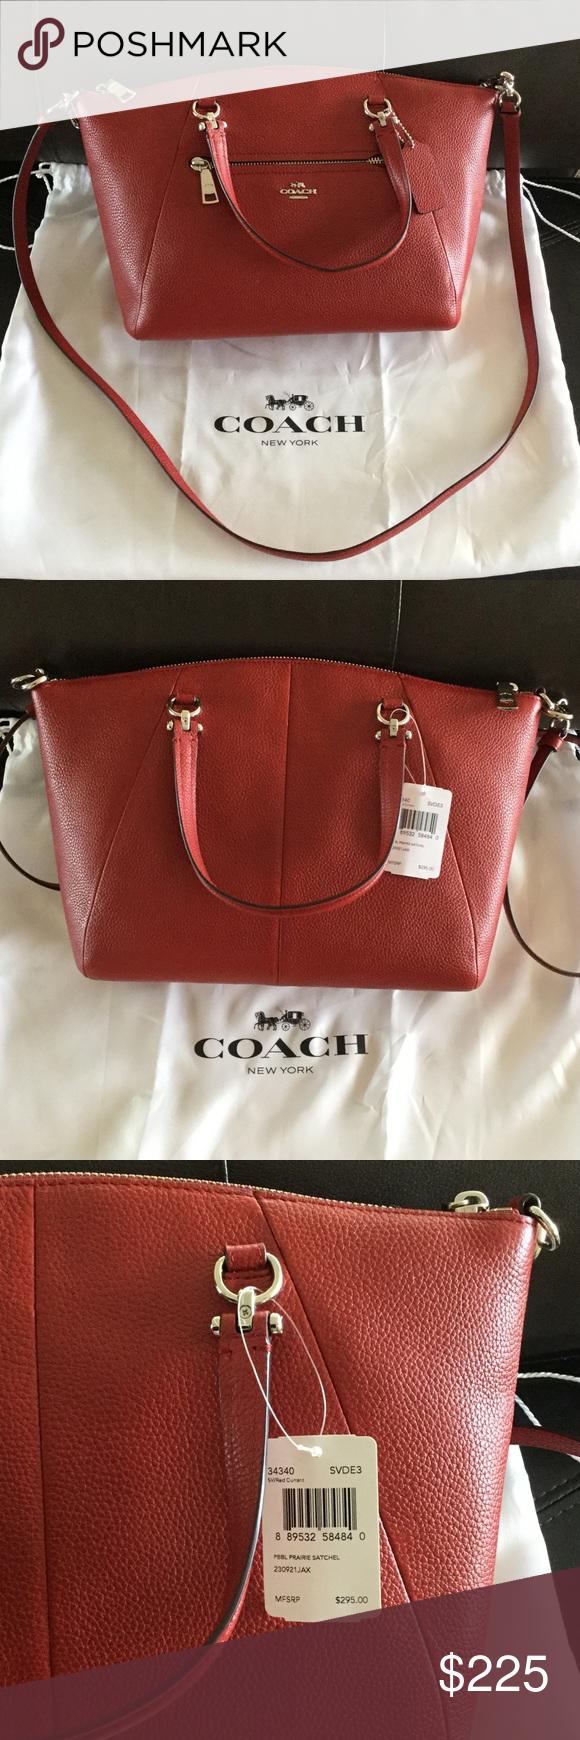 8fb60fbaca08 ... australia price drop nwt authentic coach bag b910a 846d3